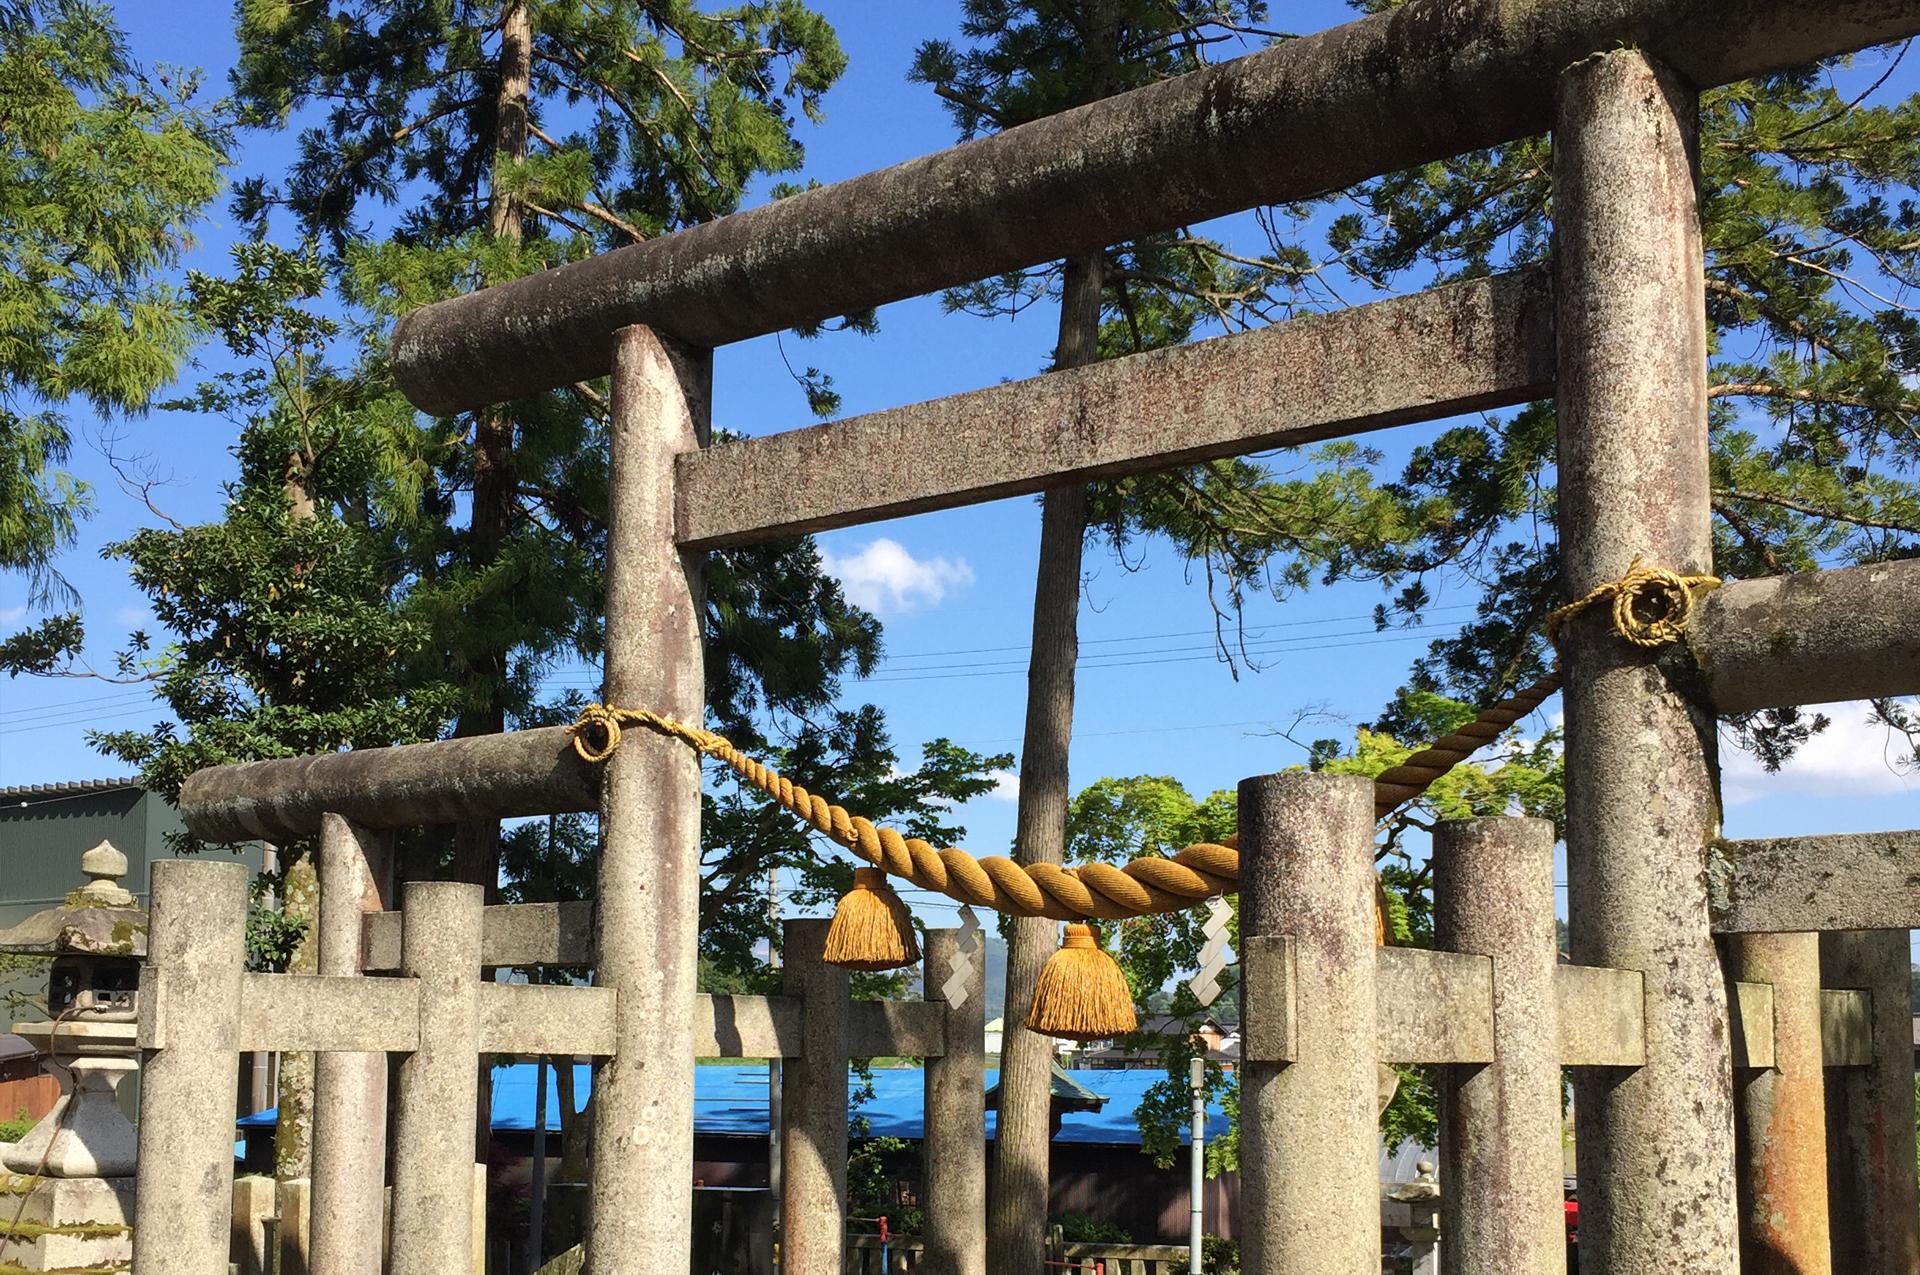 伊香具神社 – 羽衣伝説の古社